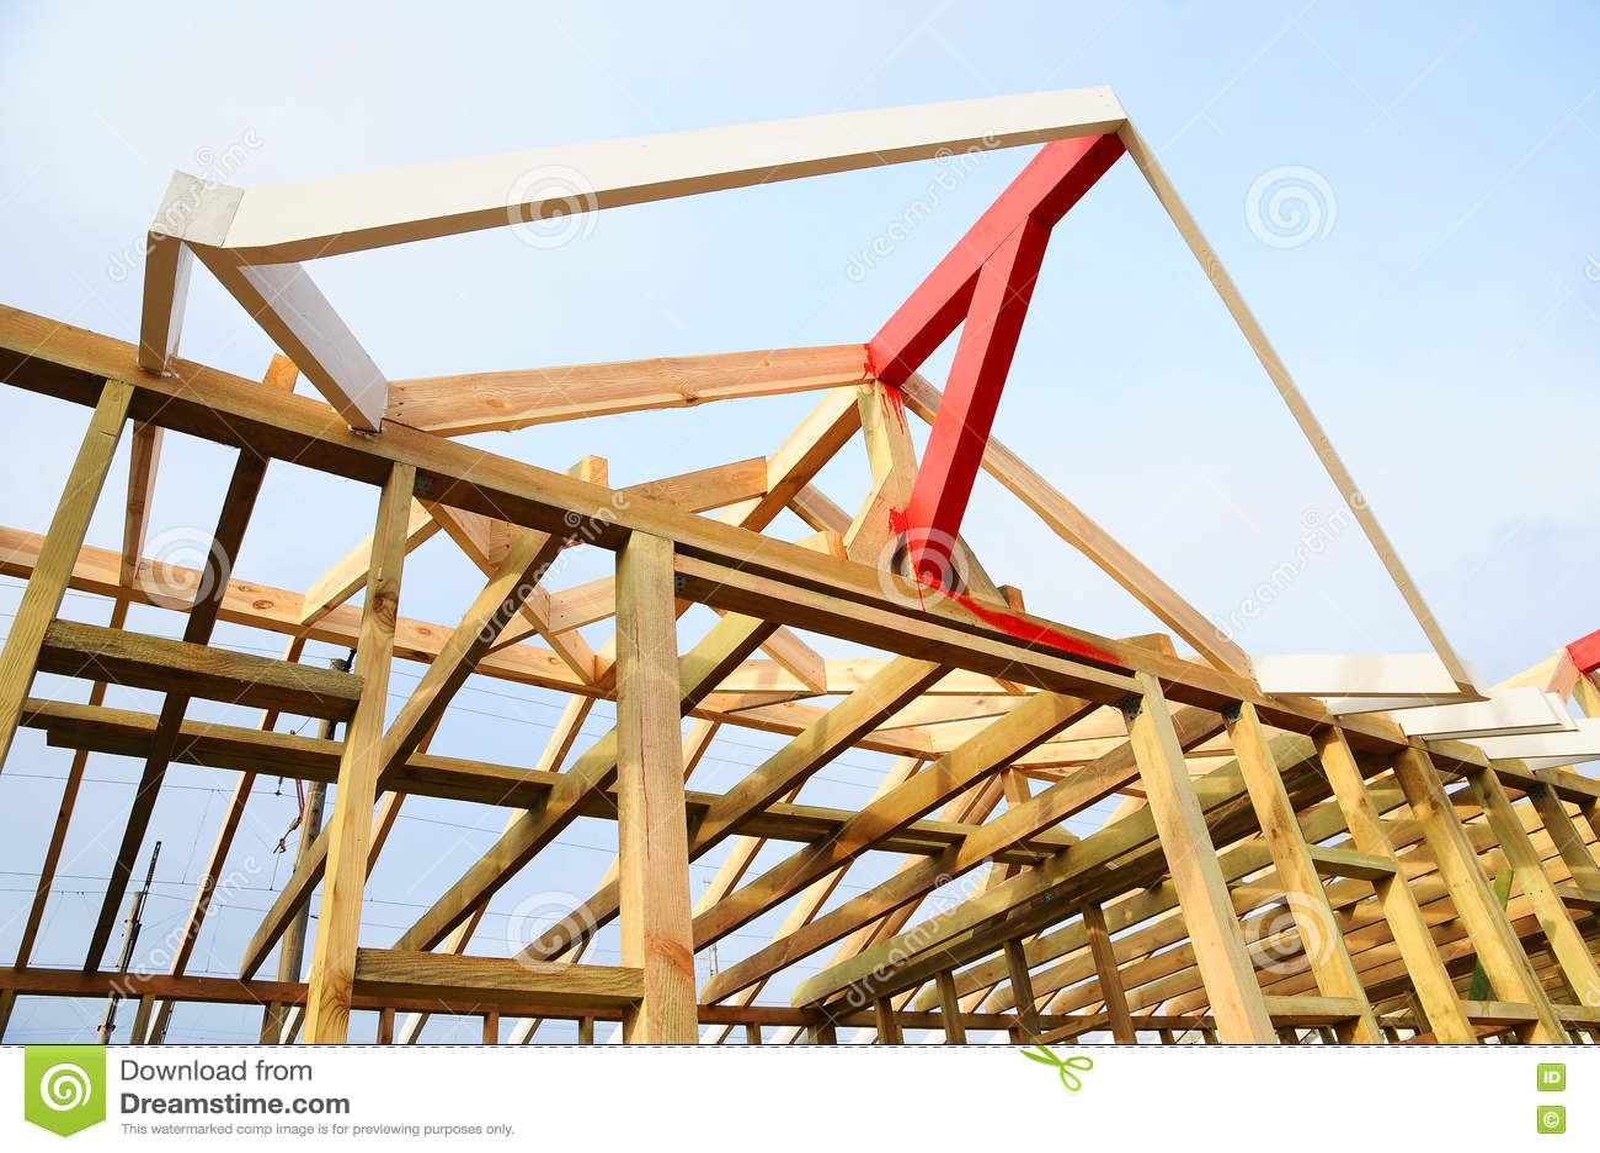 Casas con estructura de madera affordable estructura de - Casas con estructura de madera ...